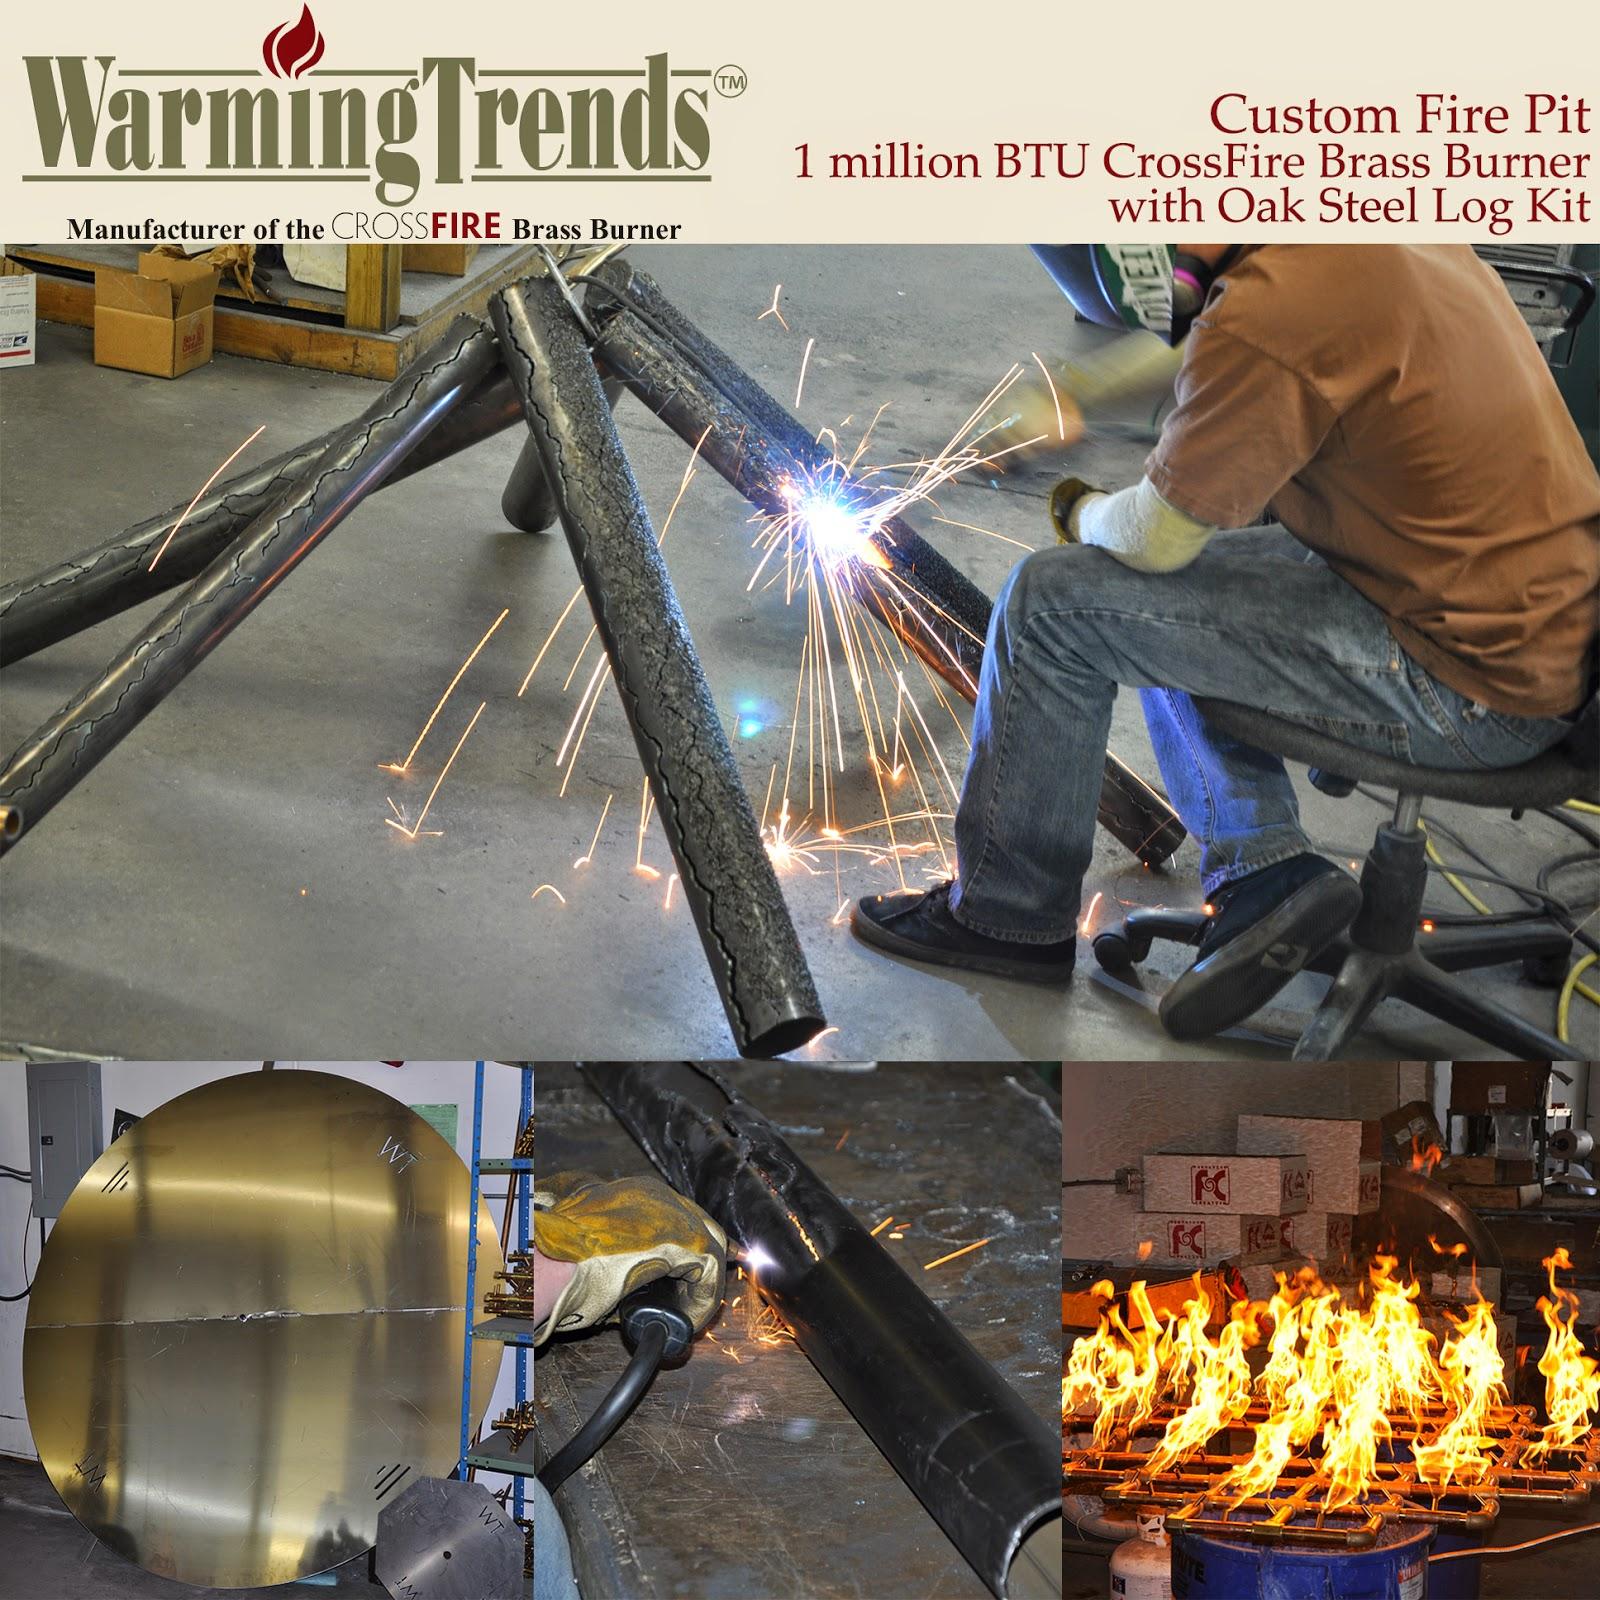 Custom Fire Pit - 1 Million BTU CrossFire Brass Burner with Oak Steel Log Set